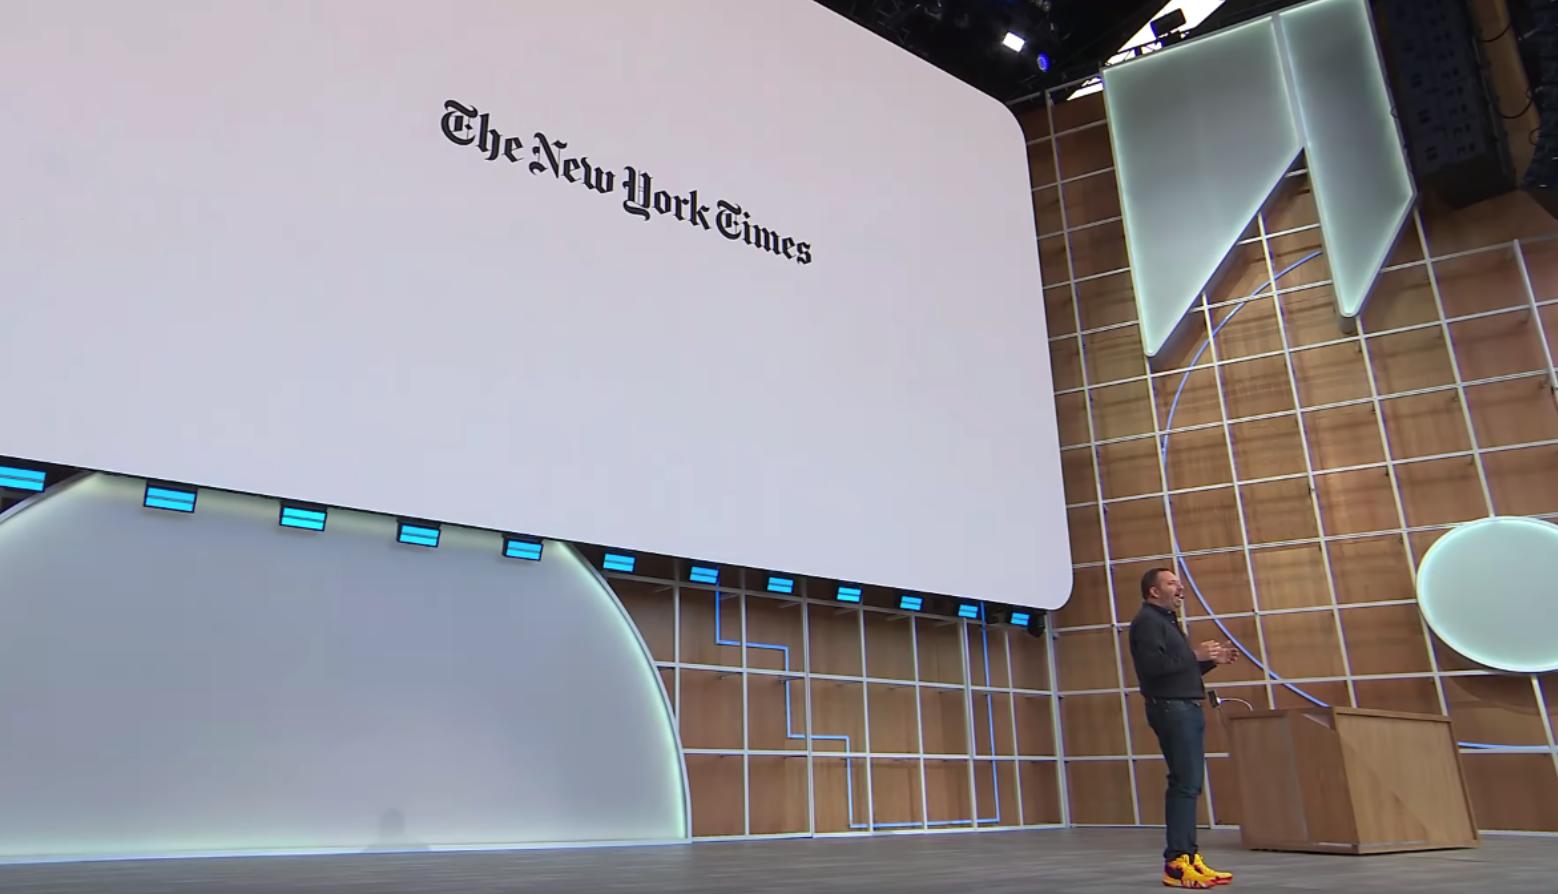 Stage at Google I/O 2019 displaying New York Times logo